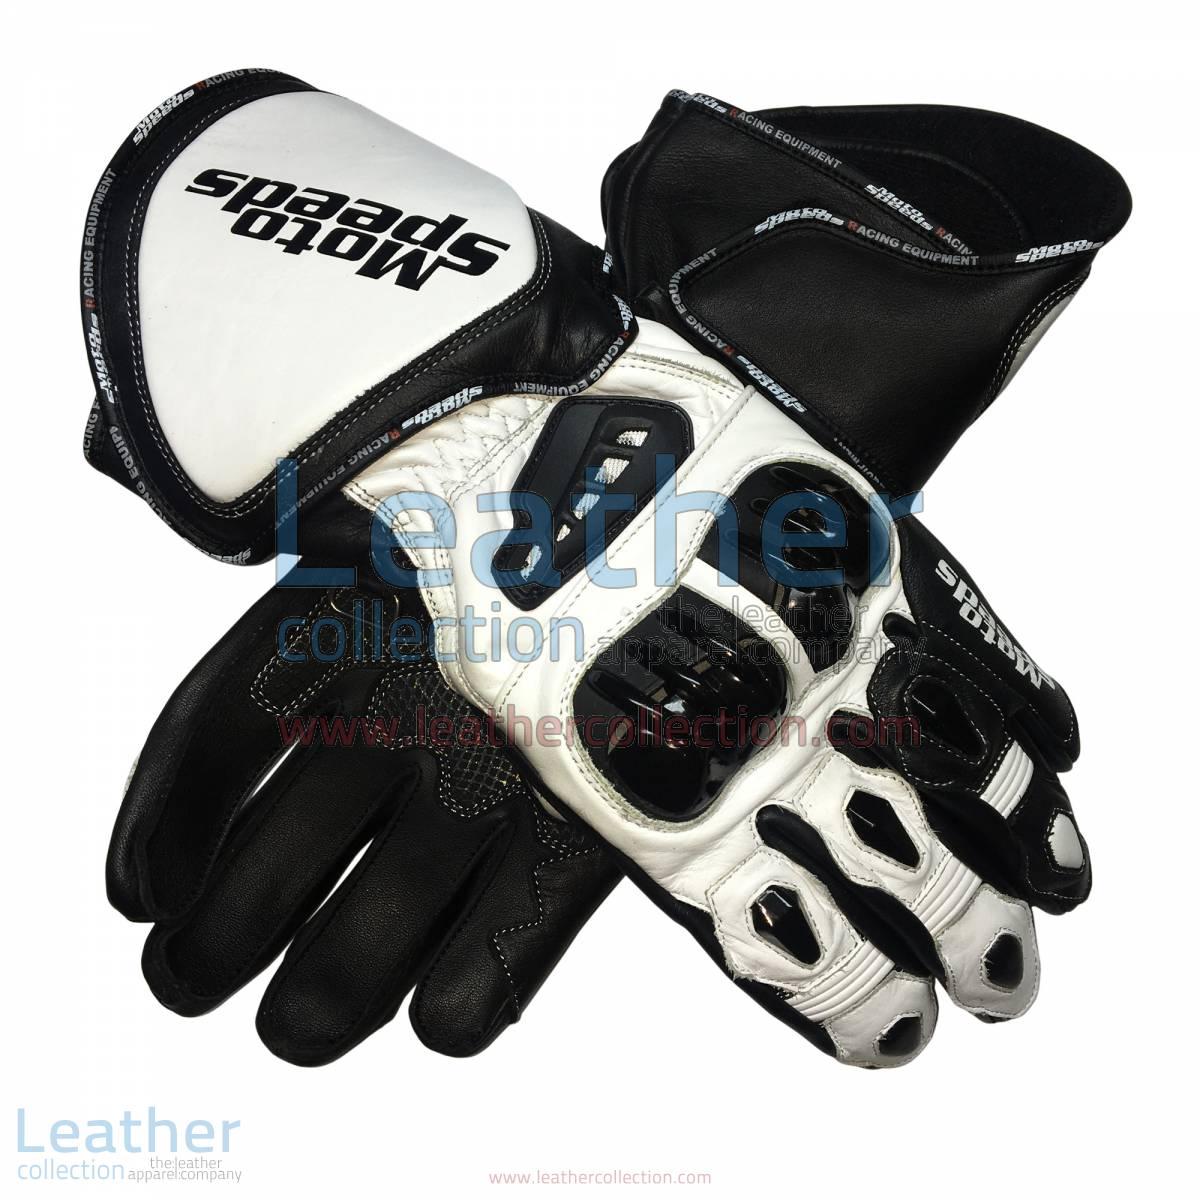 Alex Rins MotoGP 2017 Leather Gloves